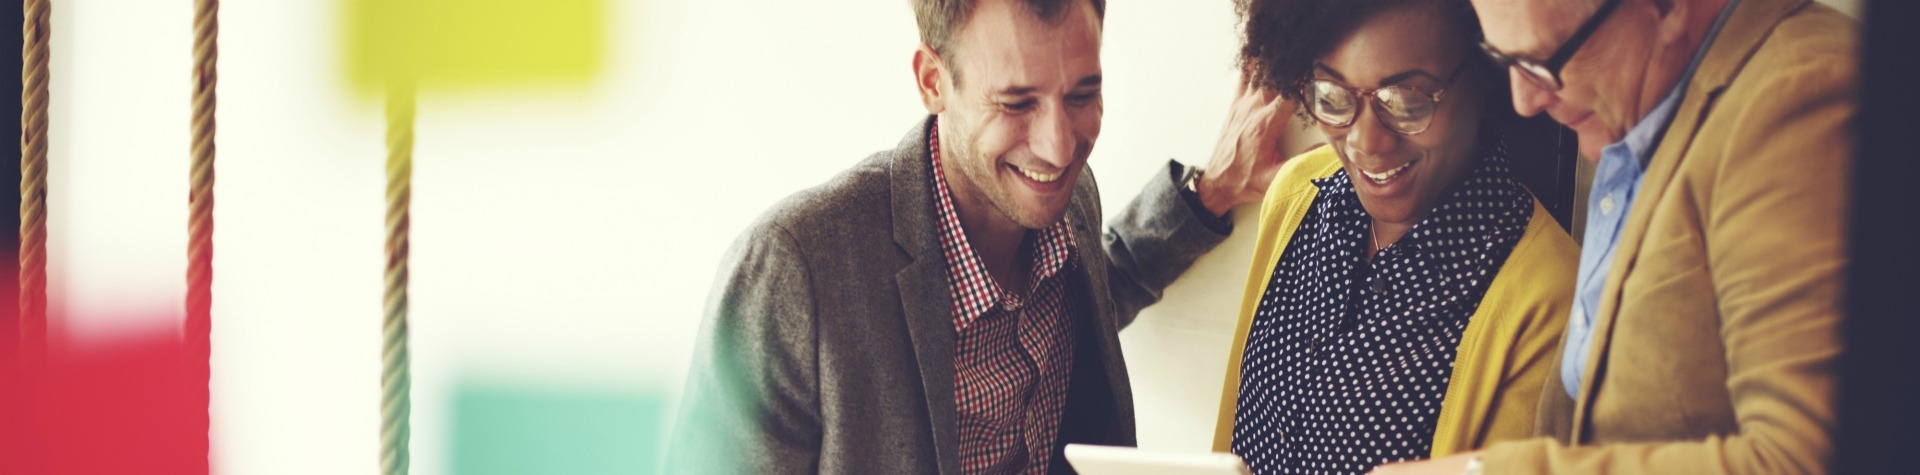 Taylor McCaffrey LLP Legal Start program for new businesses and startups